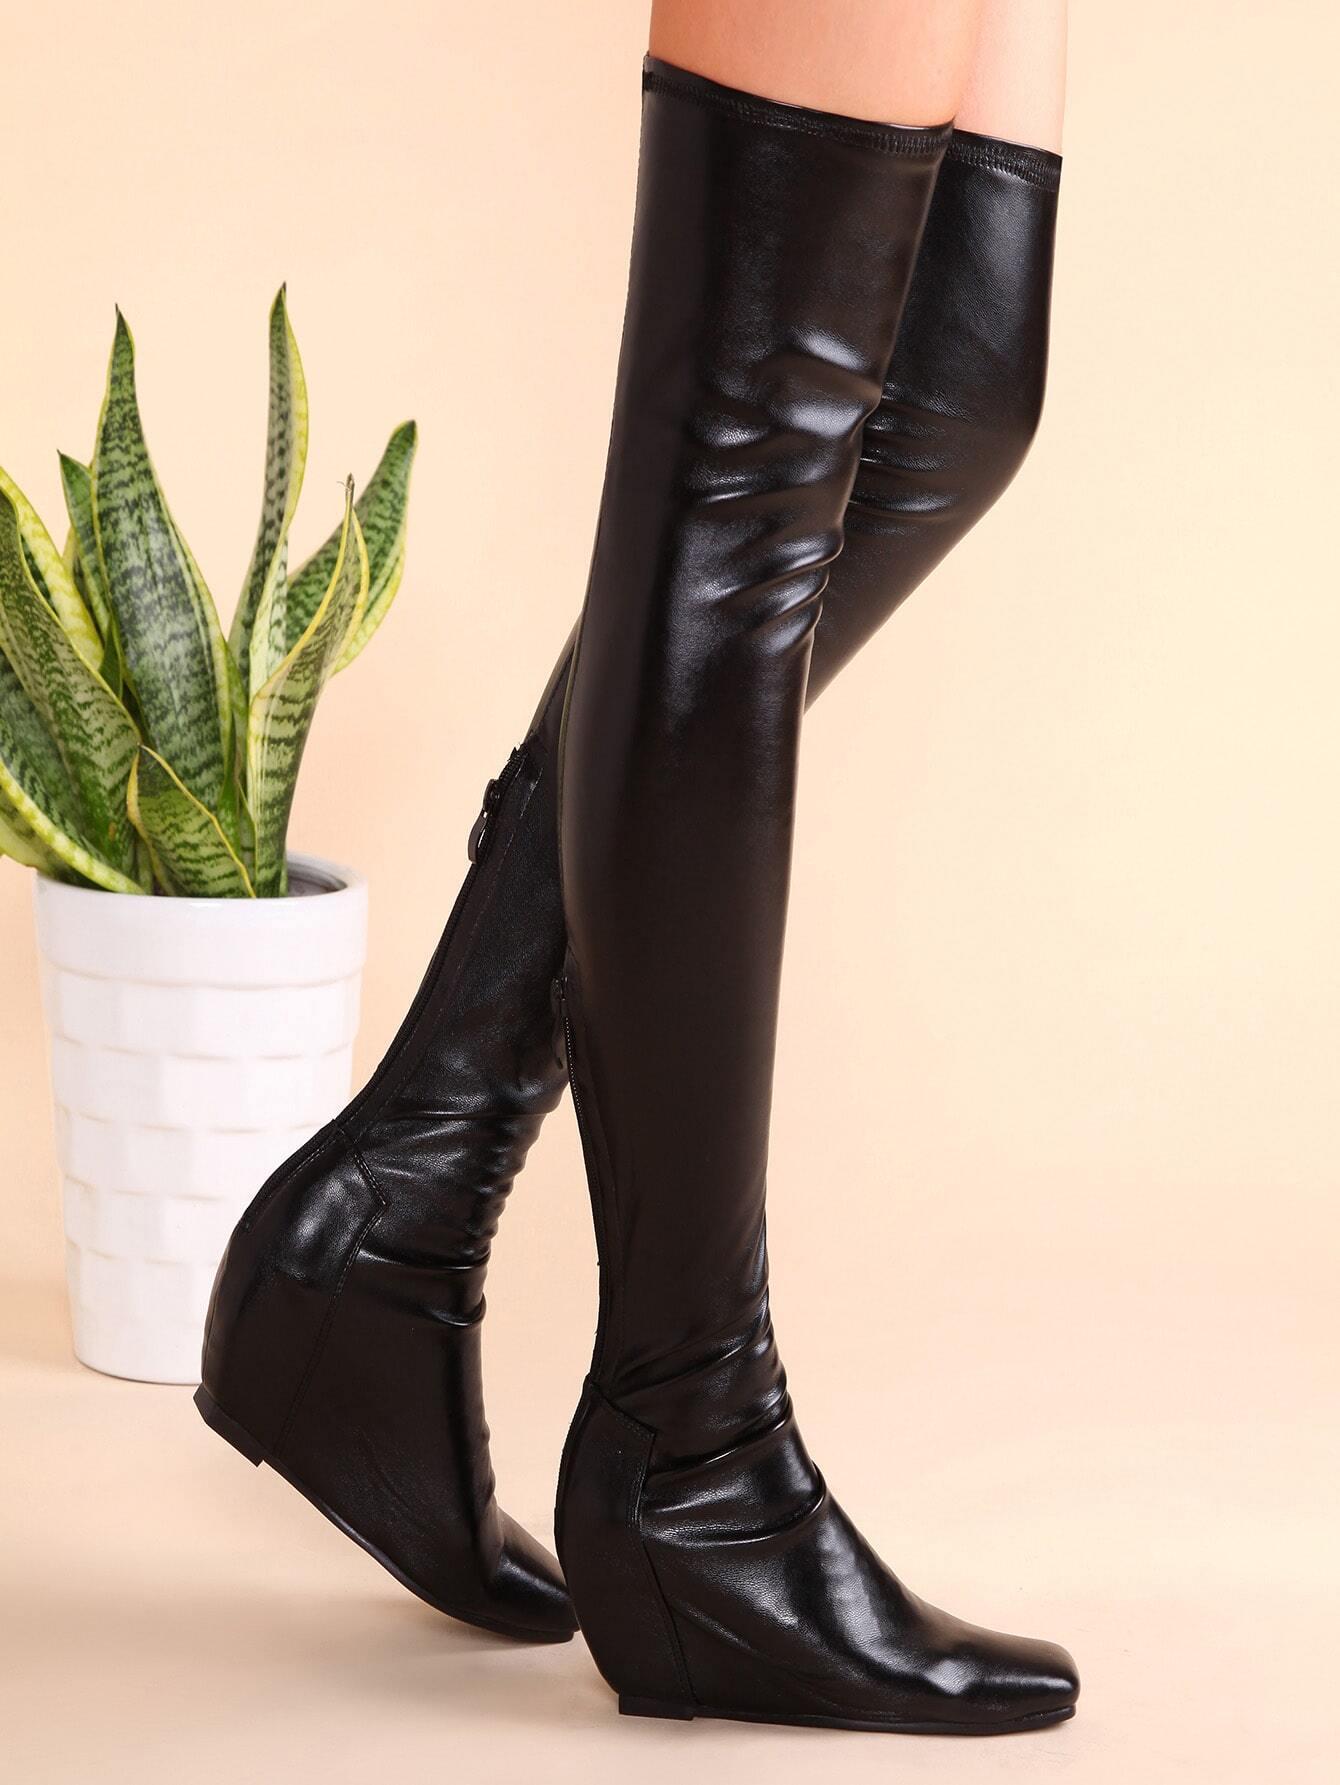 62dc0730f163 Black PU Square Toe Back Zipper Hidden Wedge Thigh High Boots  -SheIn(Sheinside)